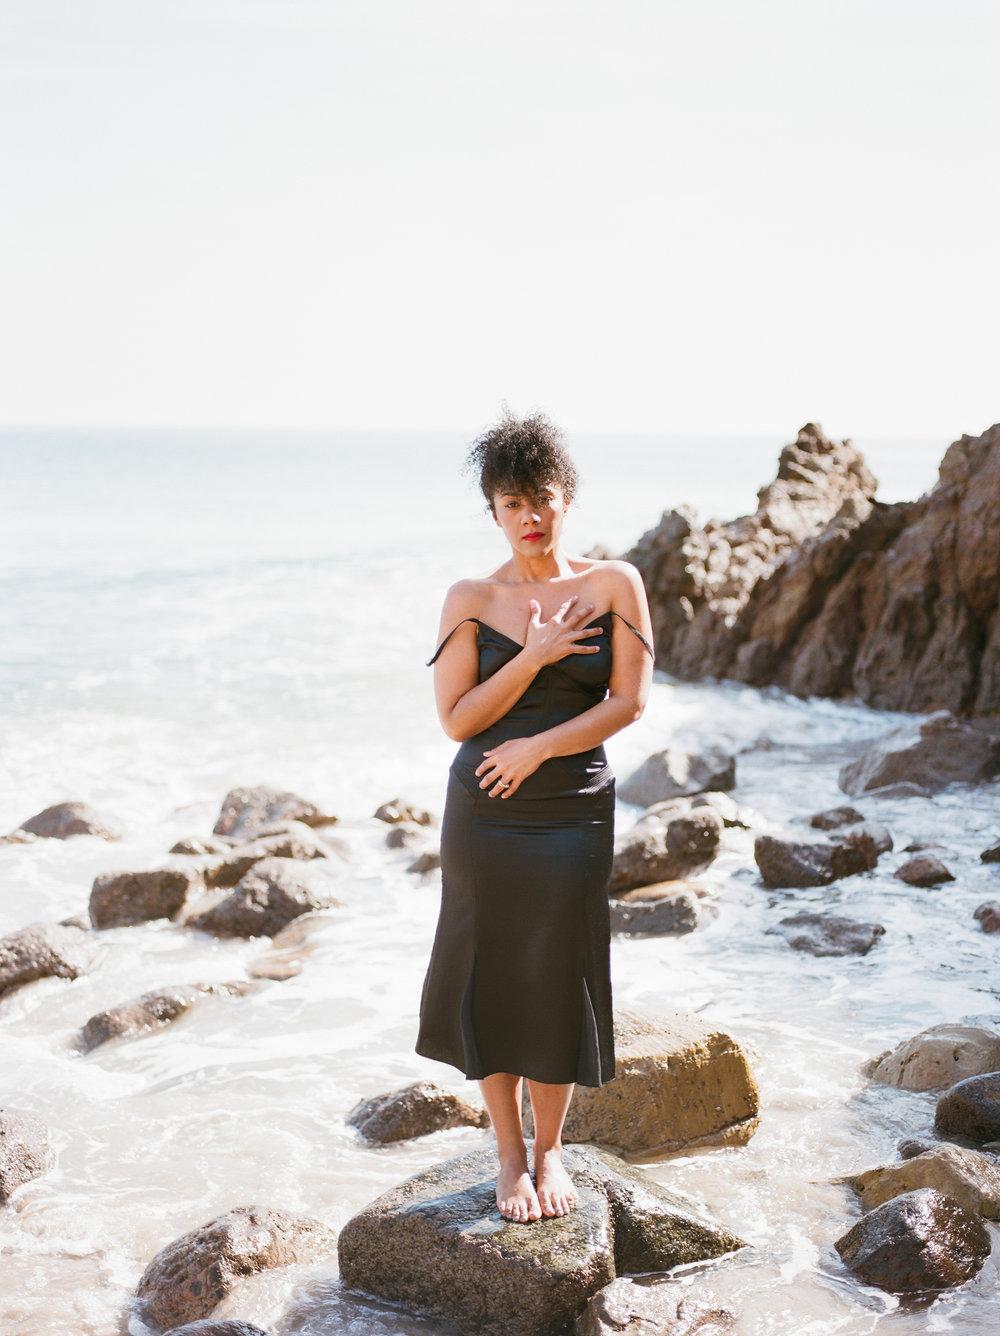 Malibu Point Dume Los Angeles Photographer Film Photographer West Palm Beach Photographer Denice Lachapelle-5.jpg